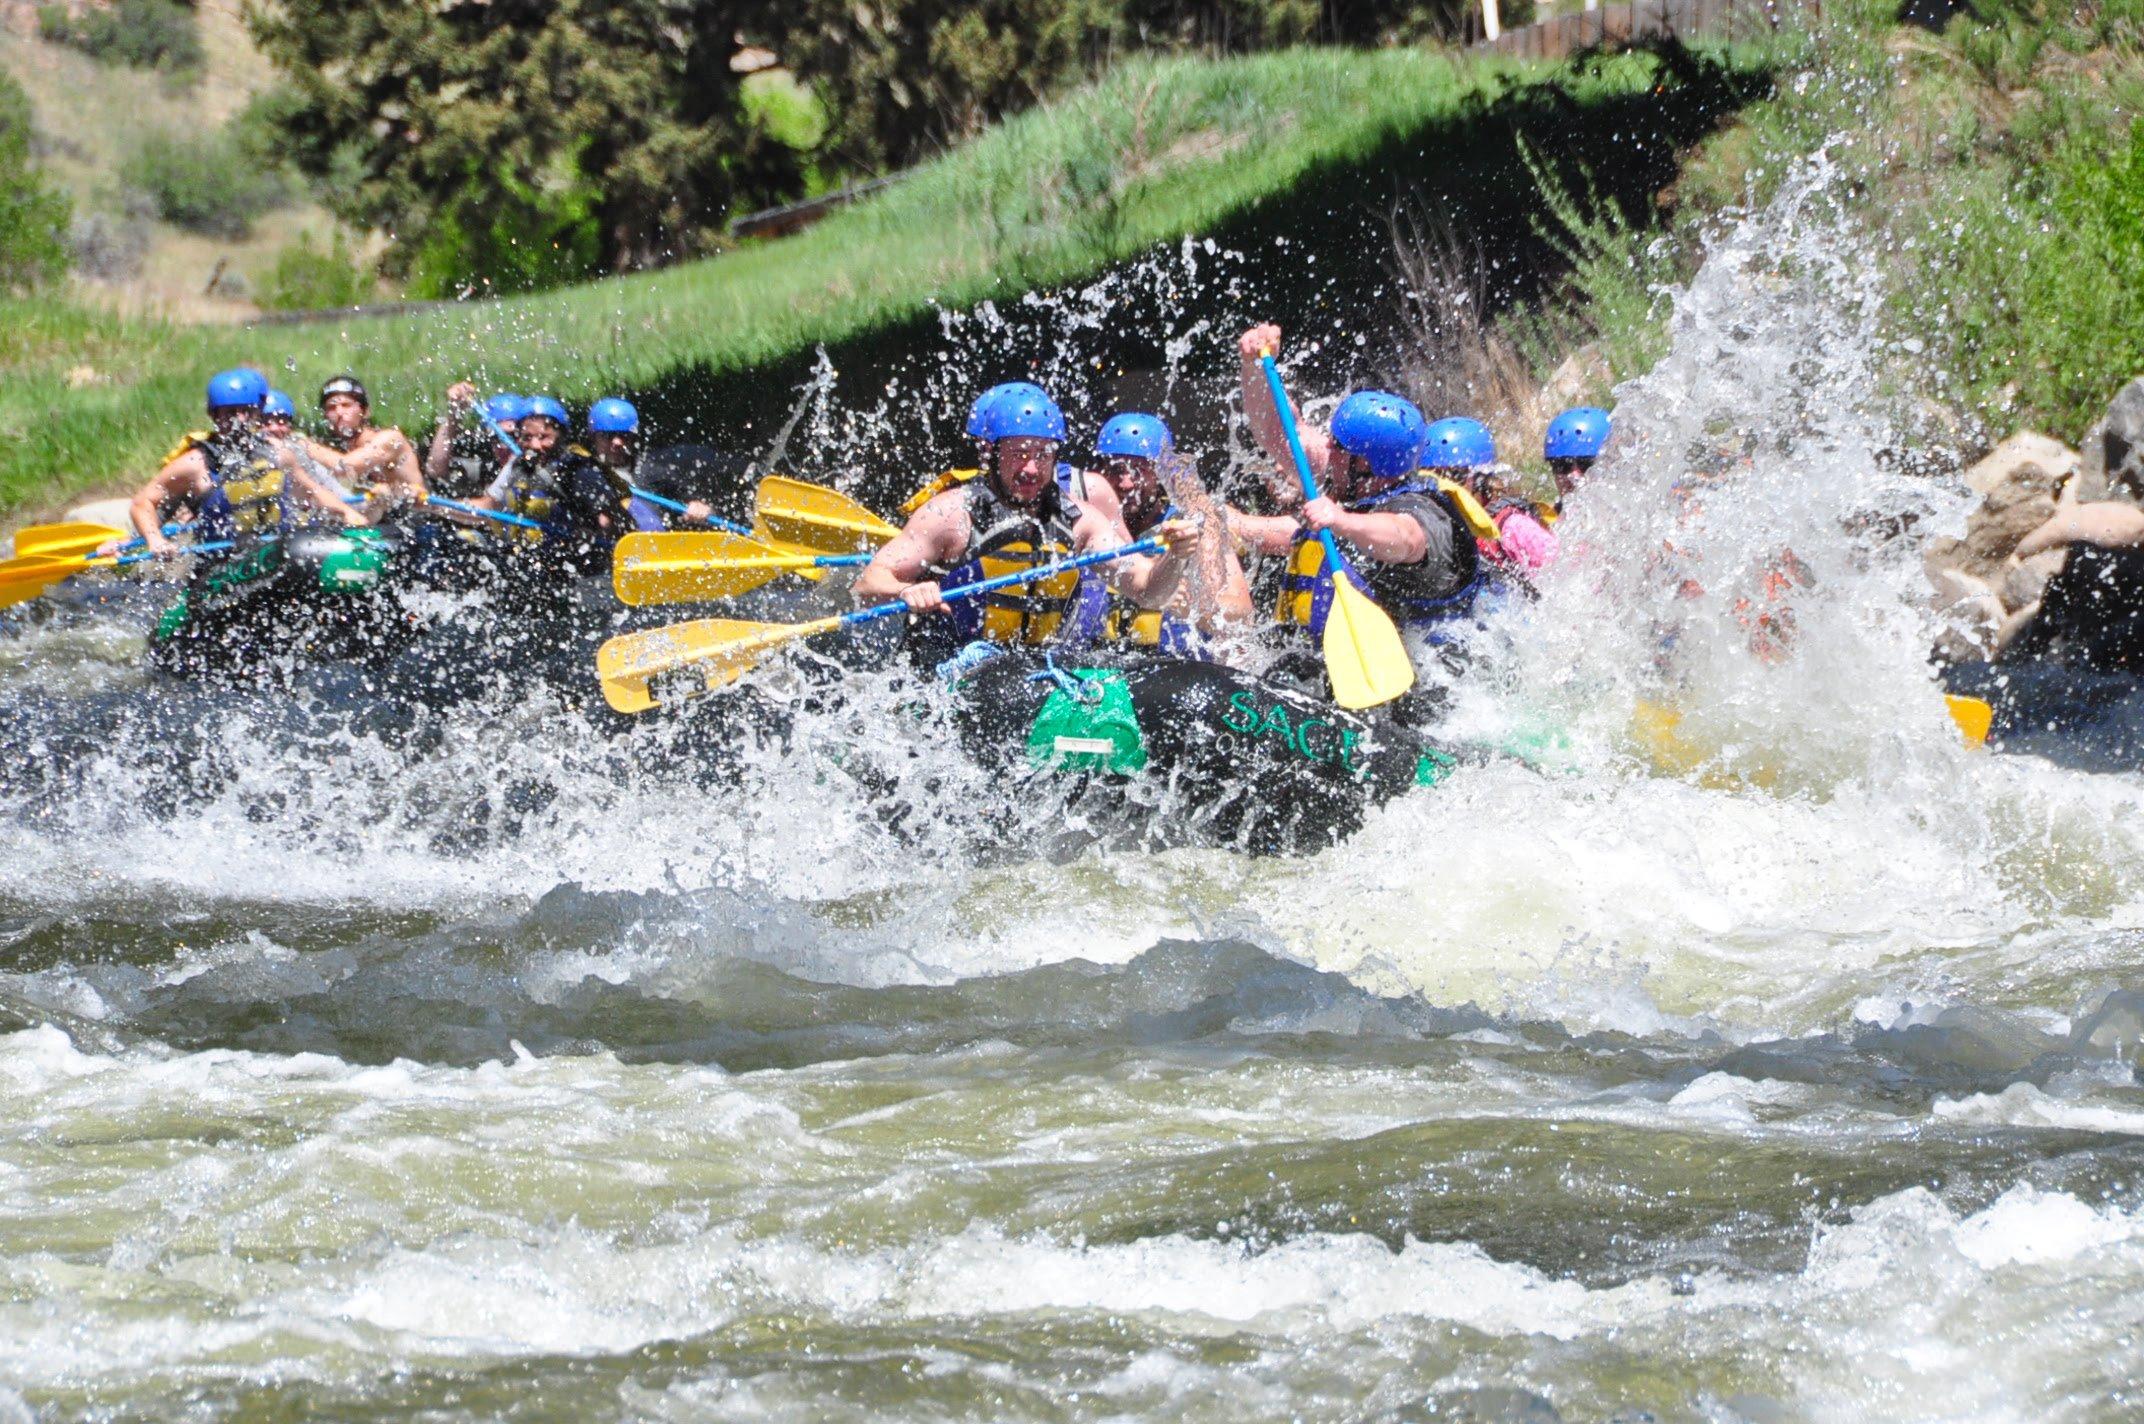 Pjpower Rafting